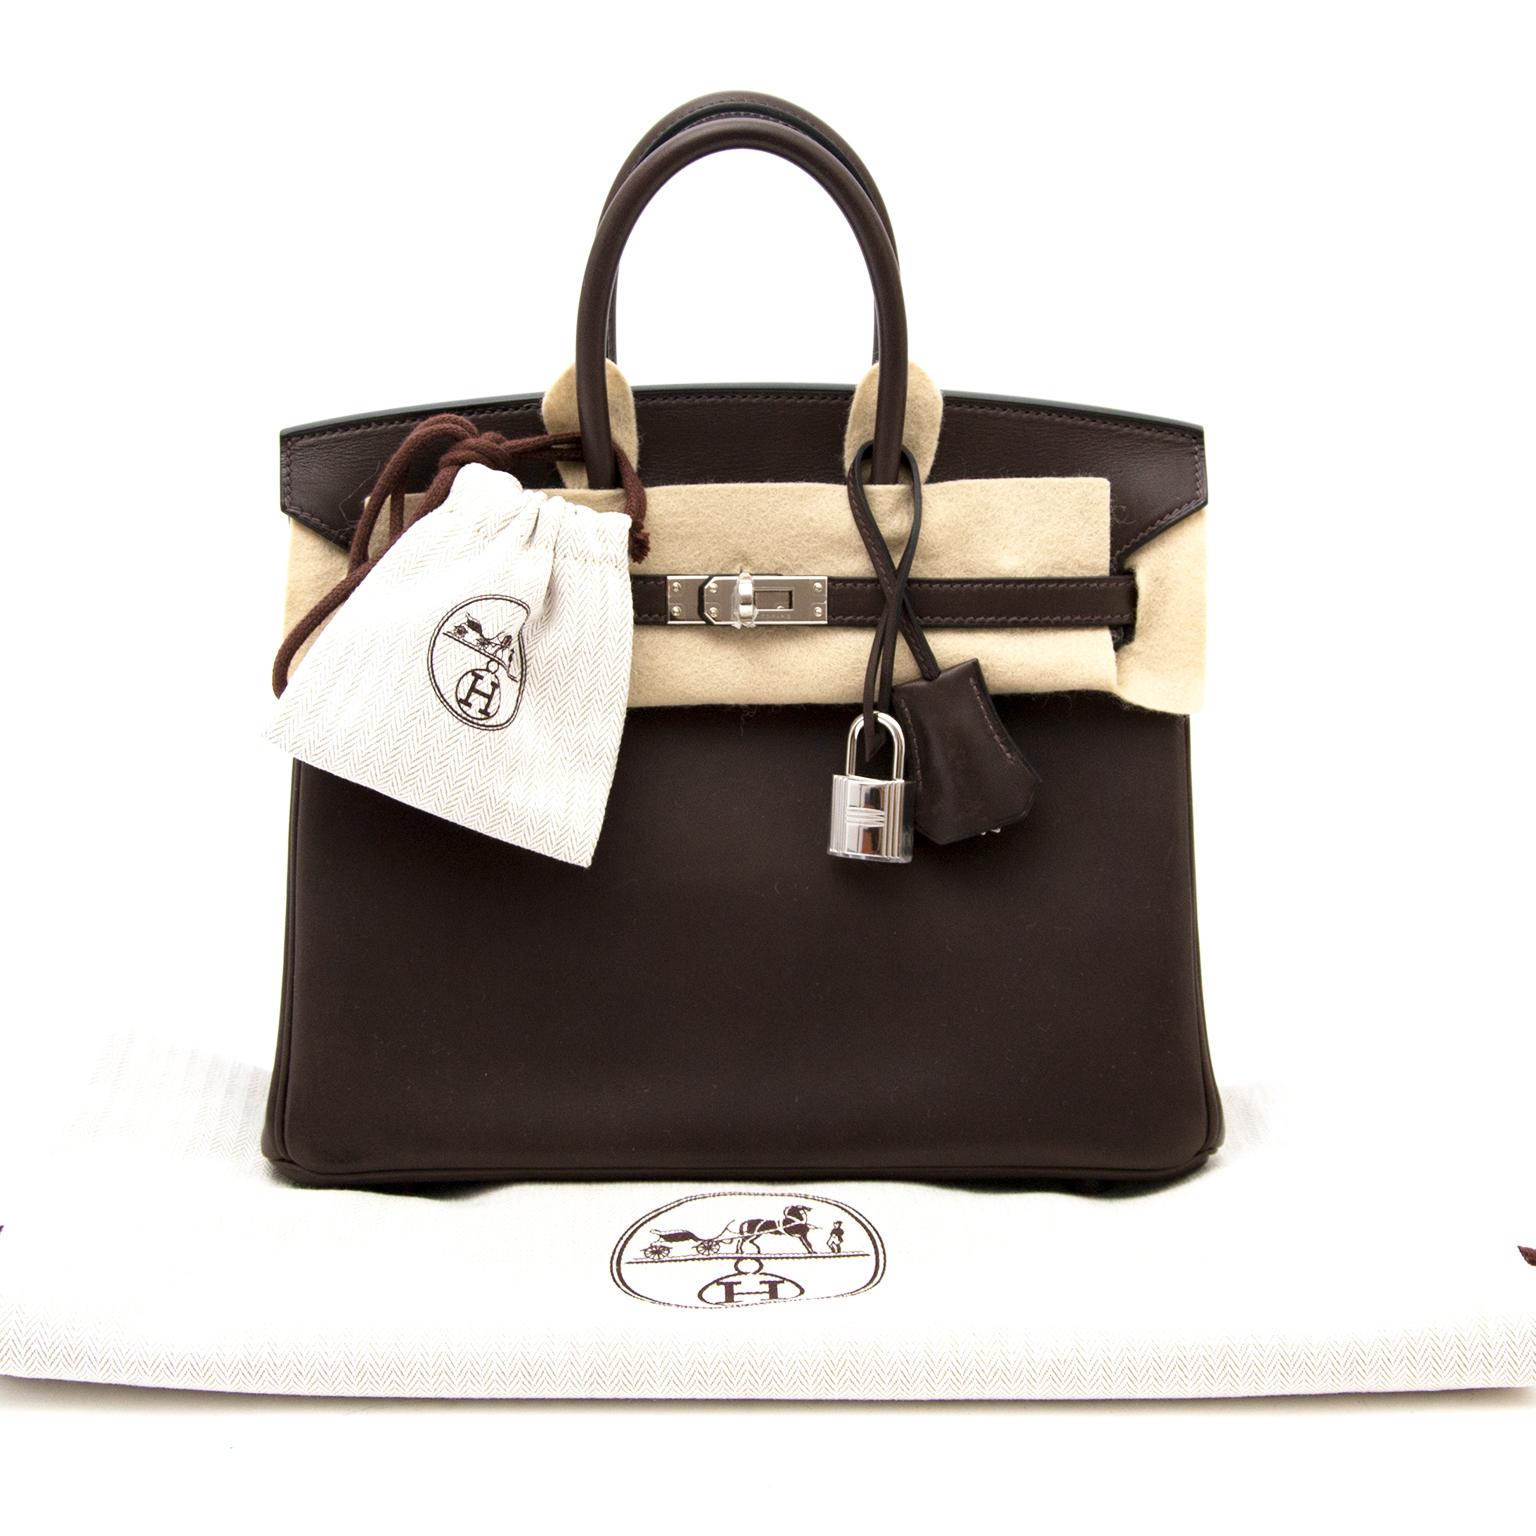 f0c567fa1f4 ... acheter en linge seconde main sac a main  NEW  Rare Brand New Hermès  Birkin